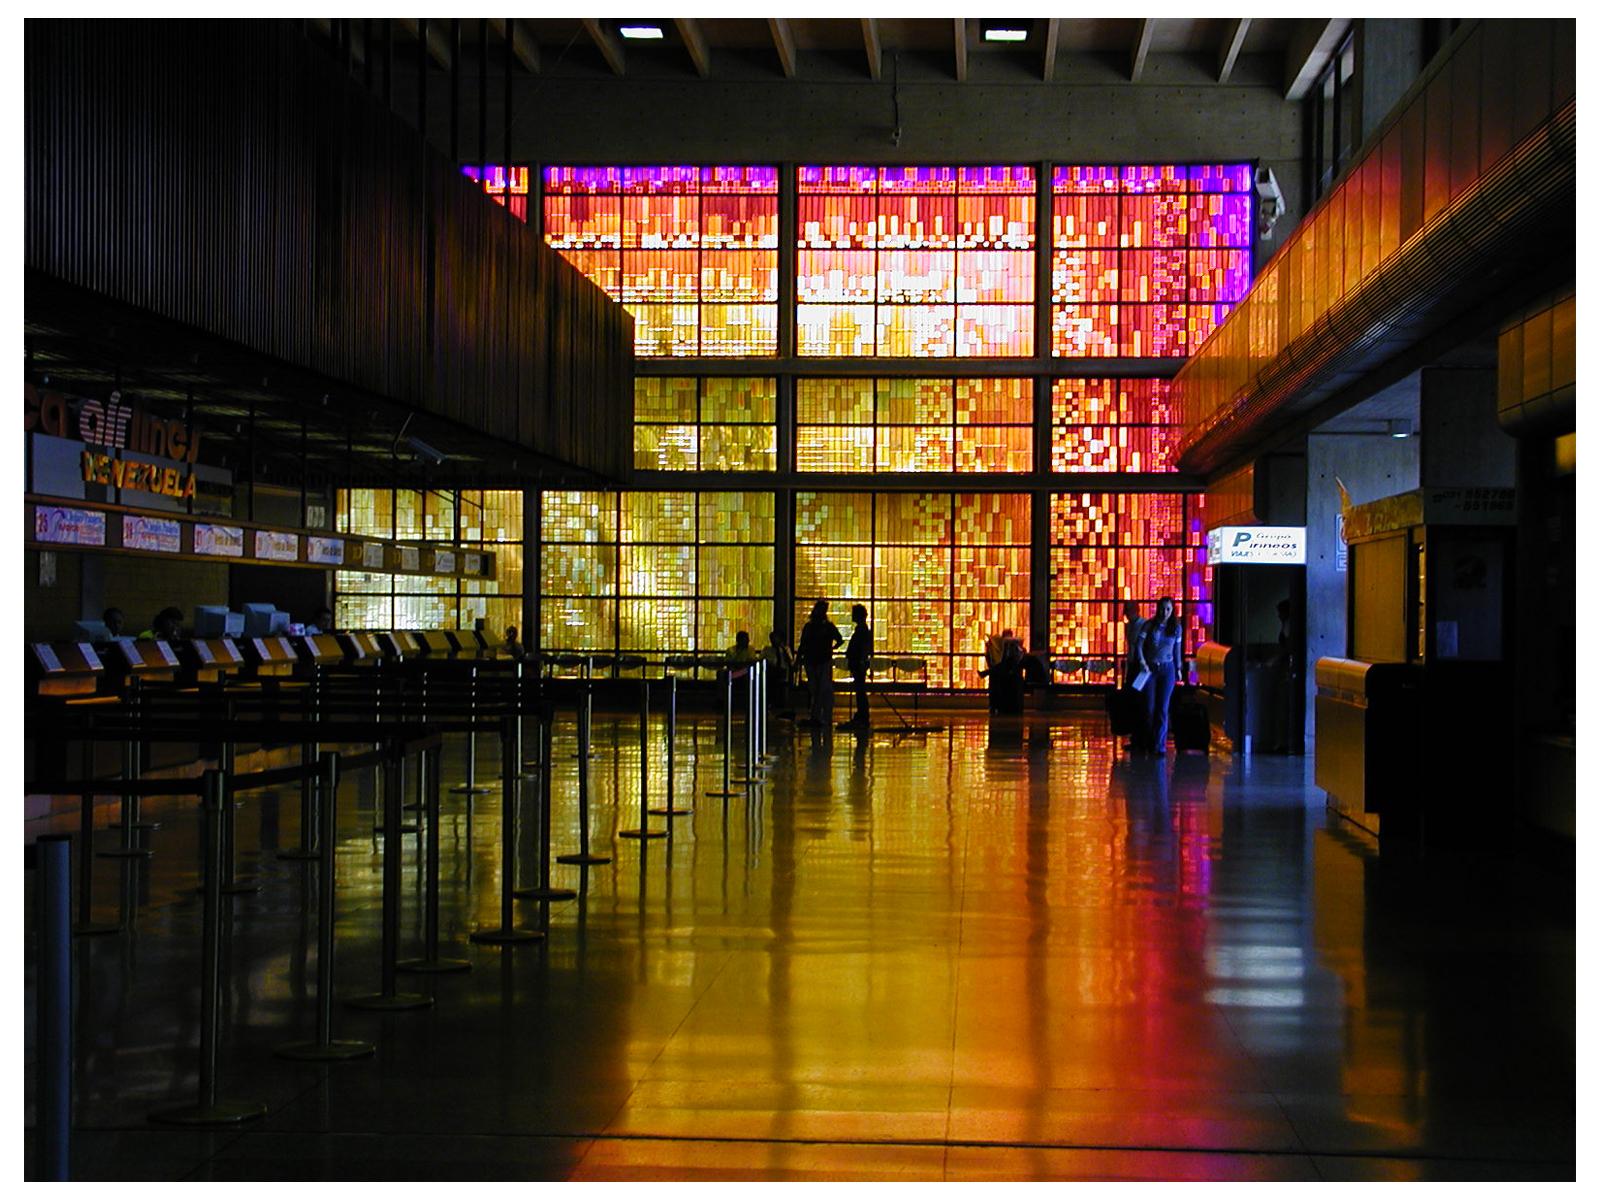 Caracas Airport, Venezuela